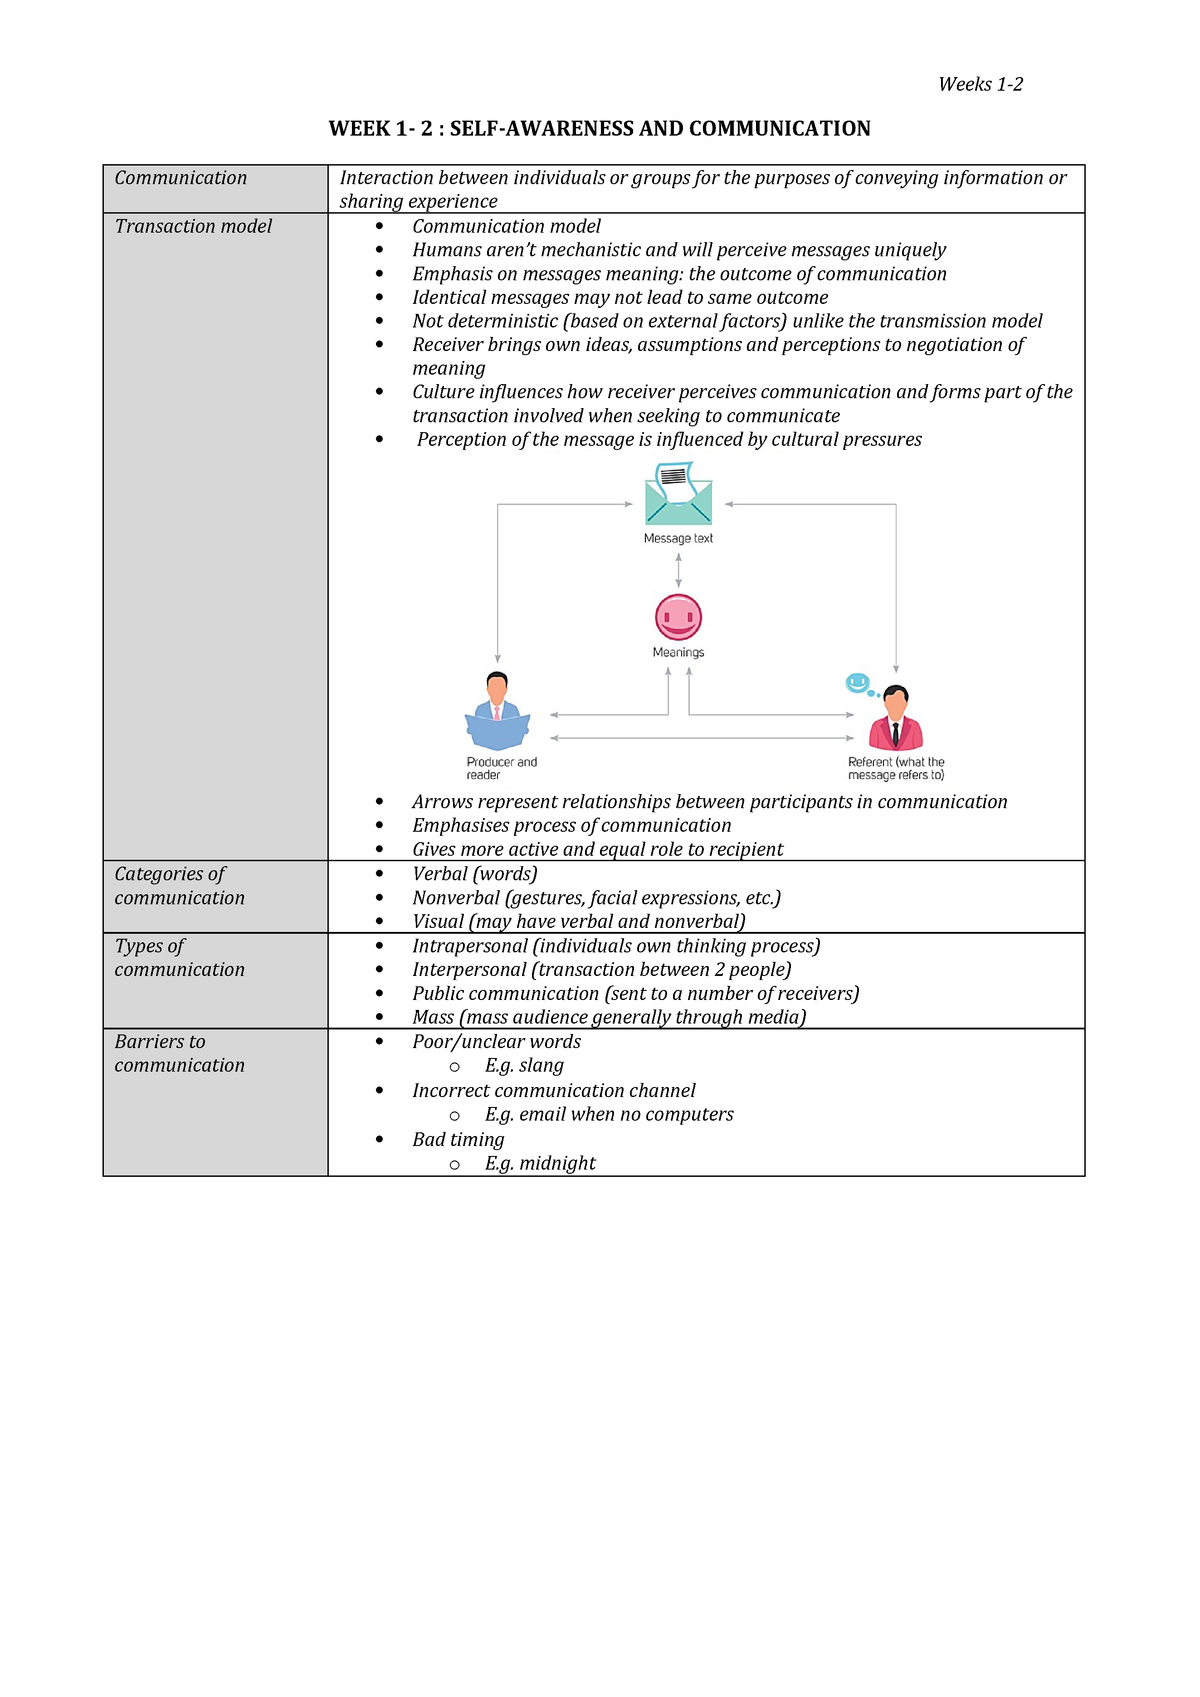 Week 1 - 2 Self Awarenss and Communication - MGF 1100 - StuDocu